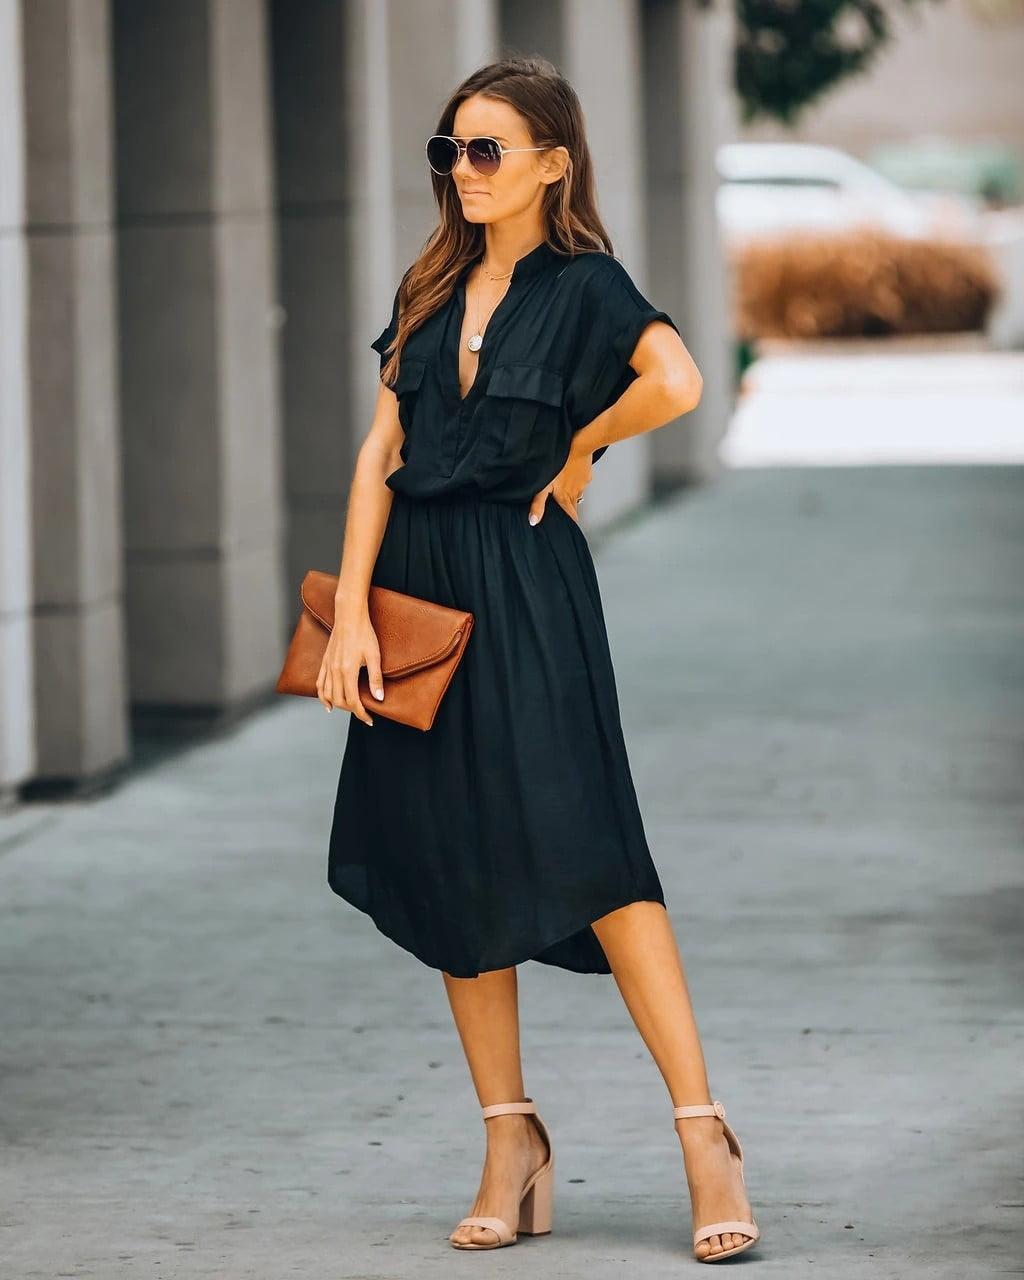 Summer black satin dress